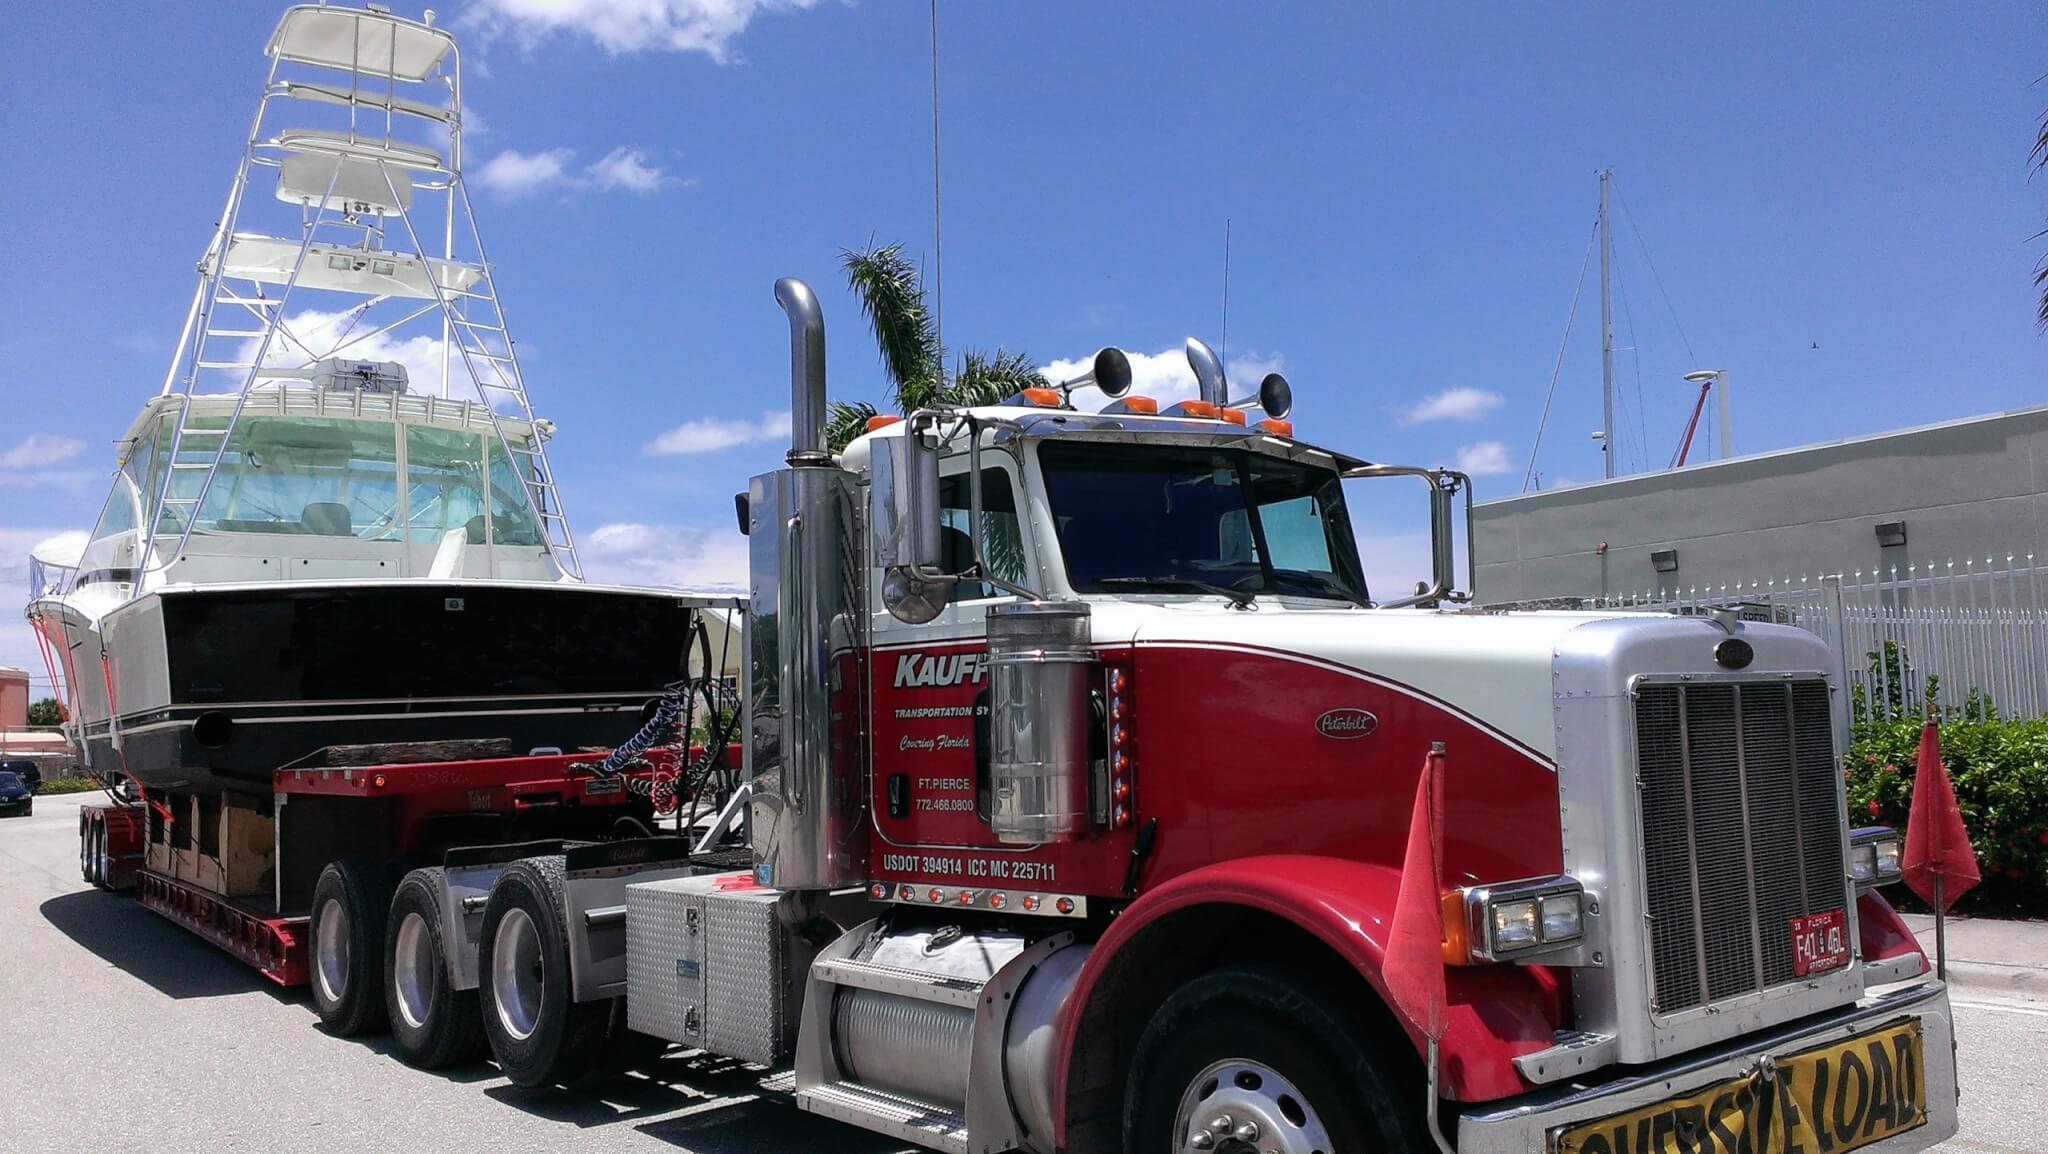 Kauff's Truck transporting Fishing Boat